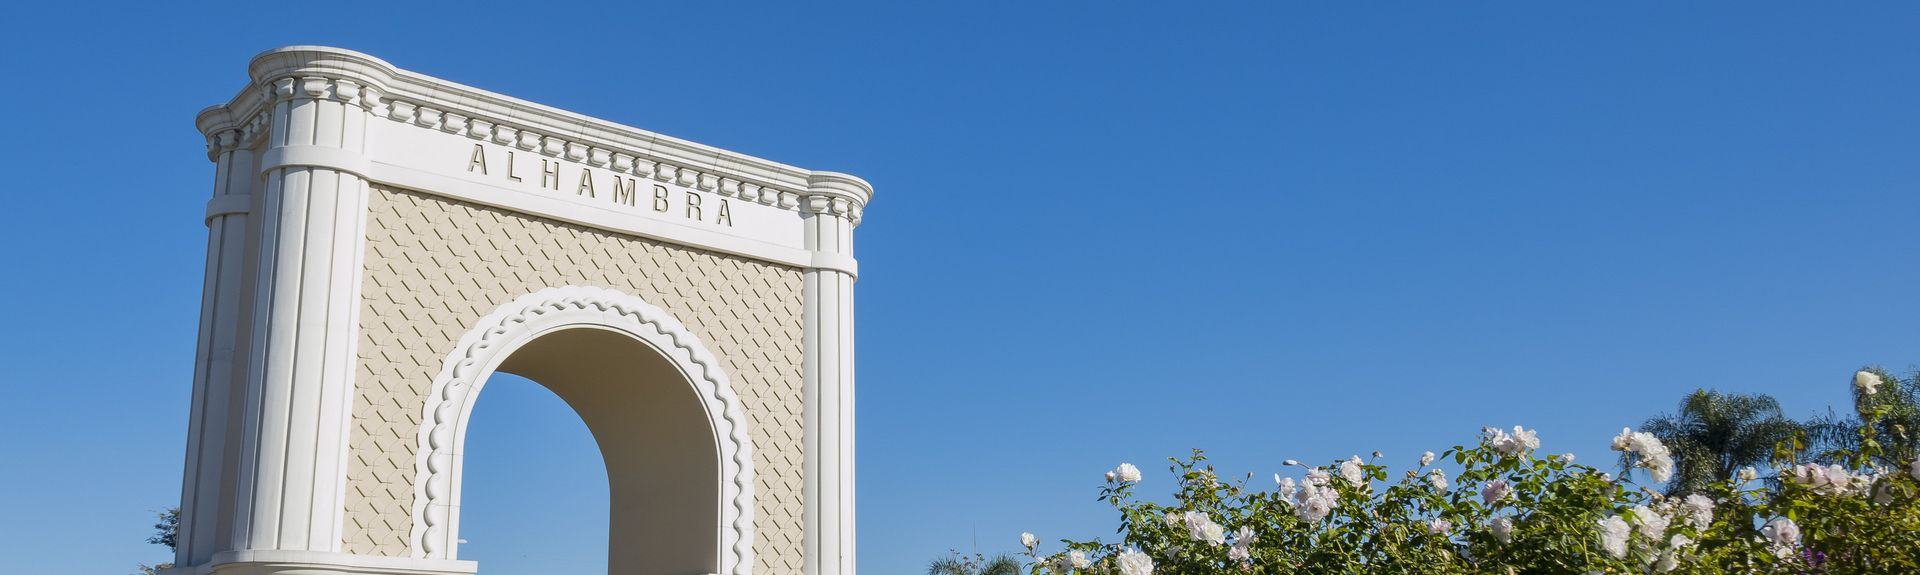 Alhambra, CA, USA